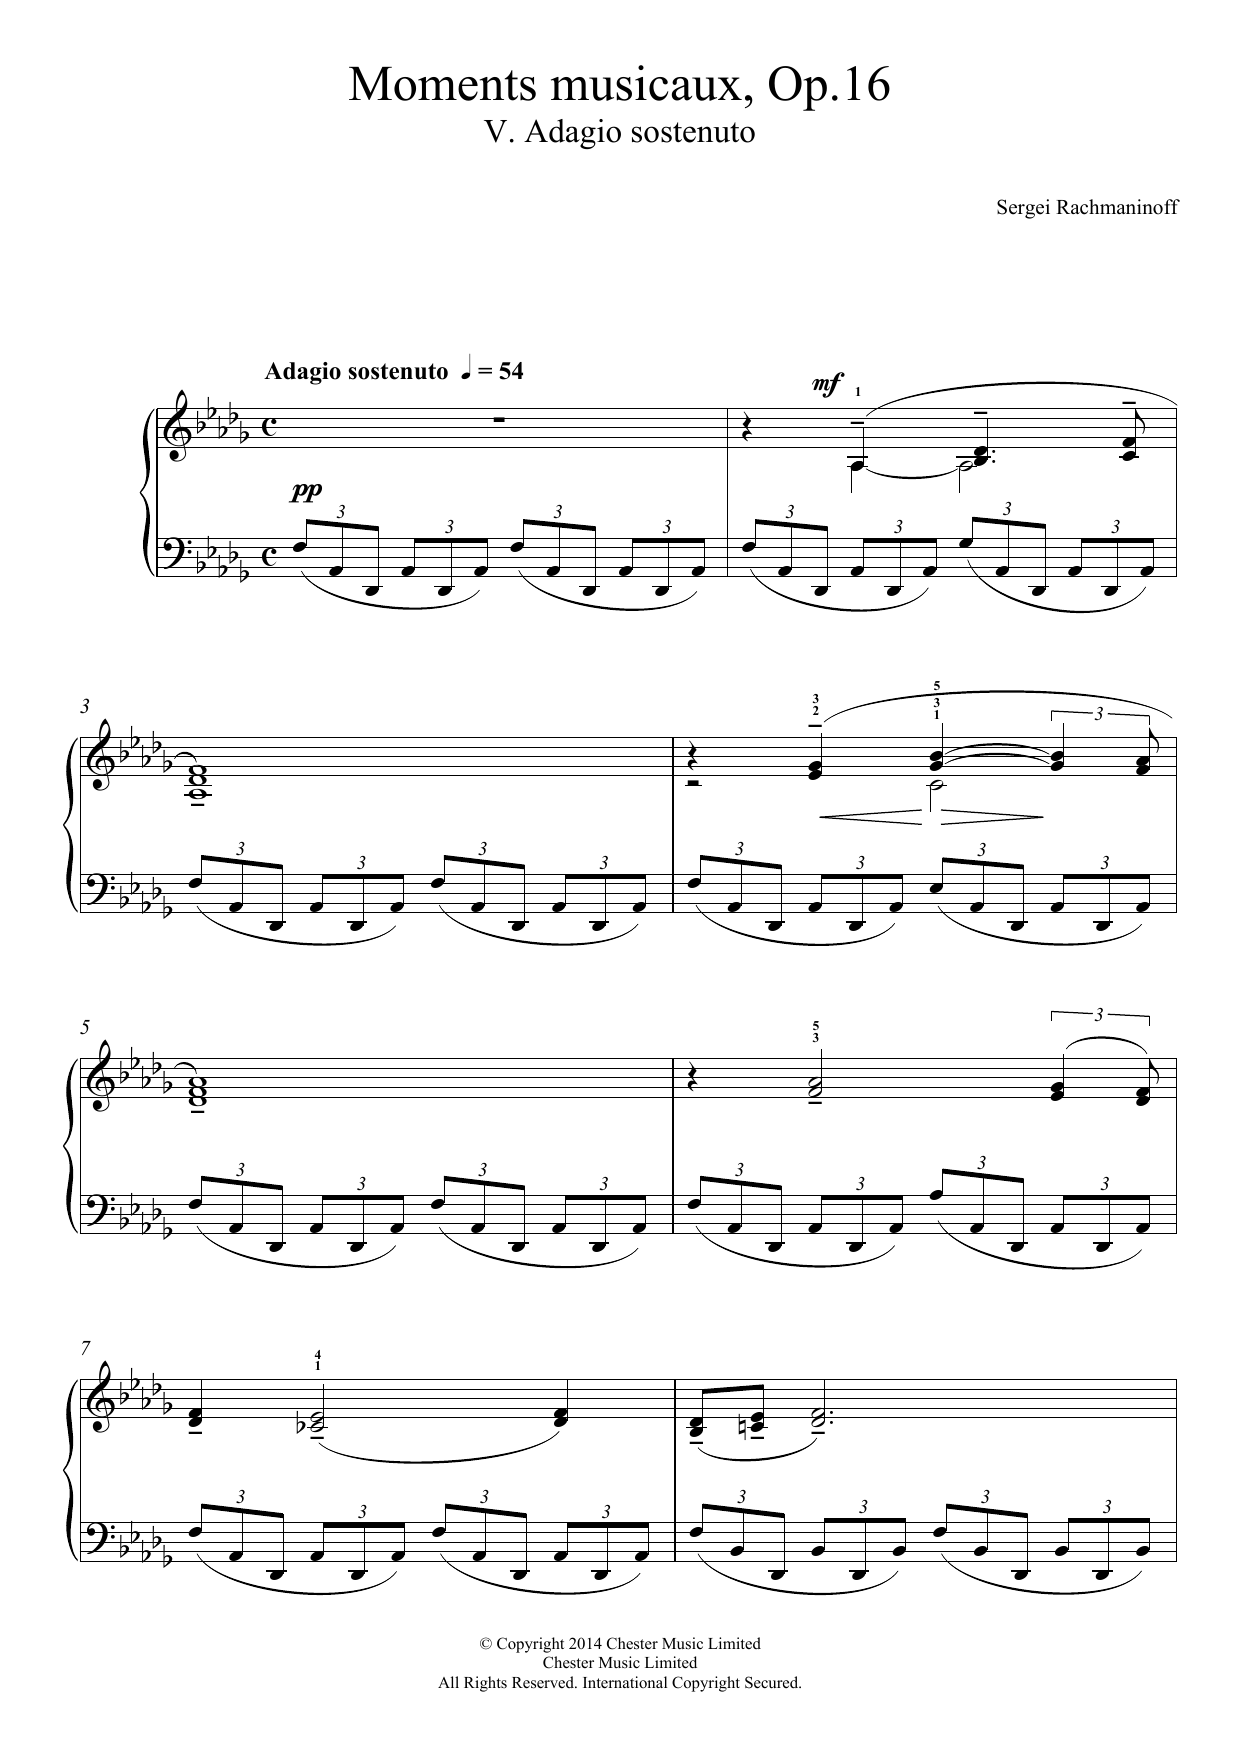 Sergei Rachmaninoff - Moments musicaux Op.16, No.5 Adagio sostenuto